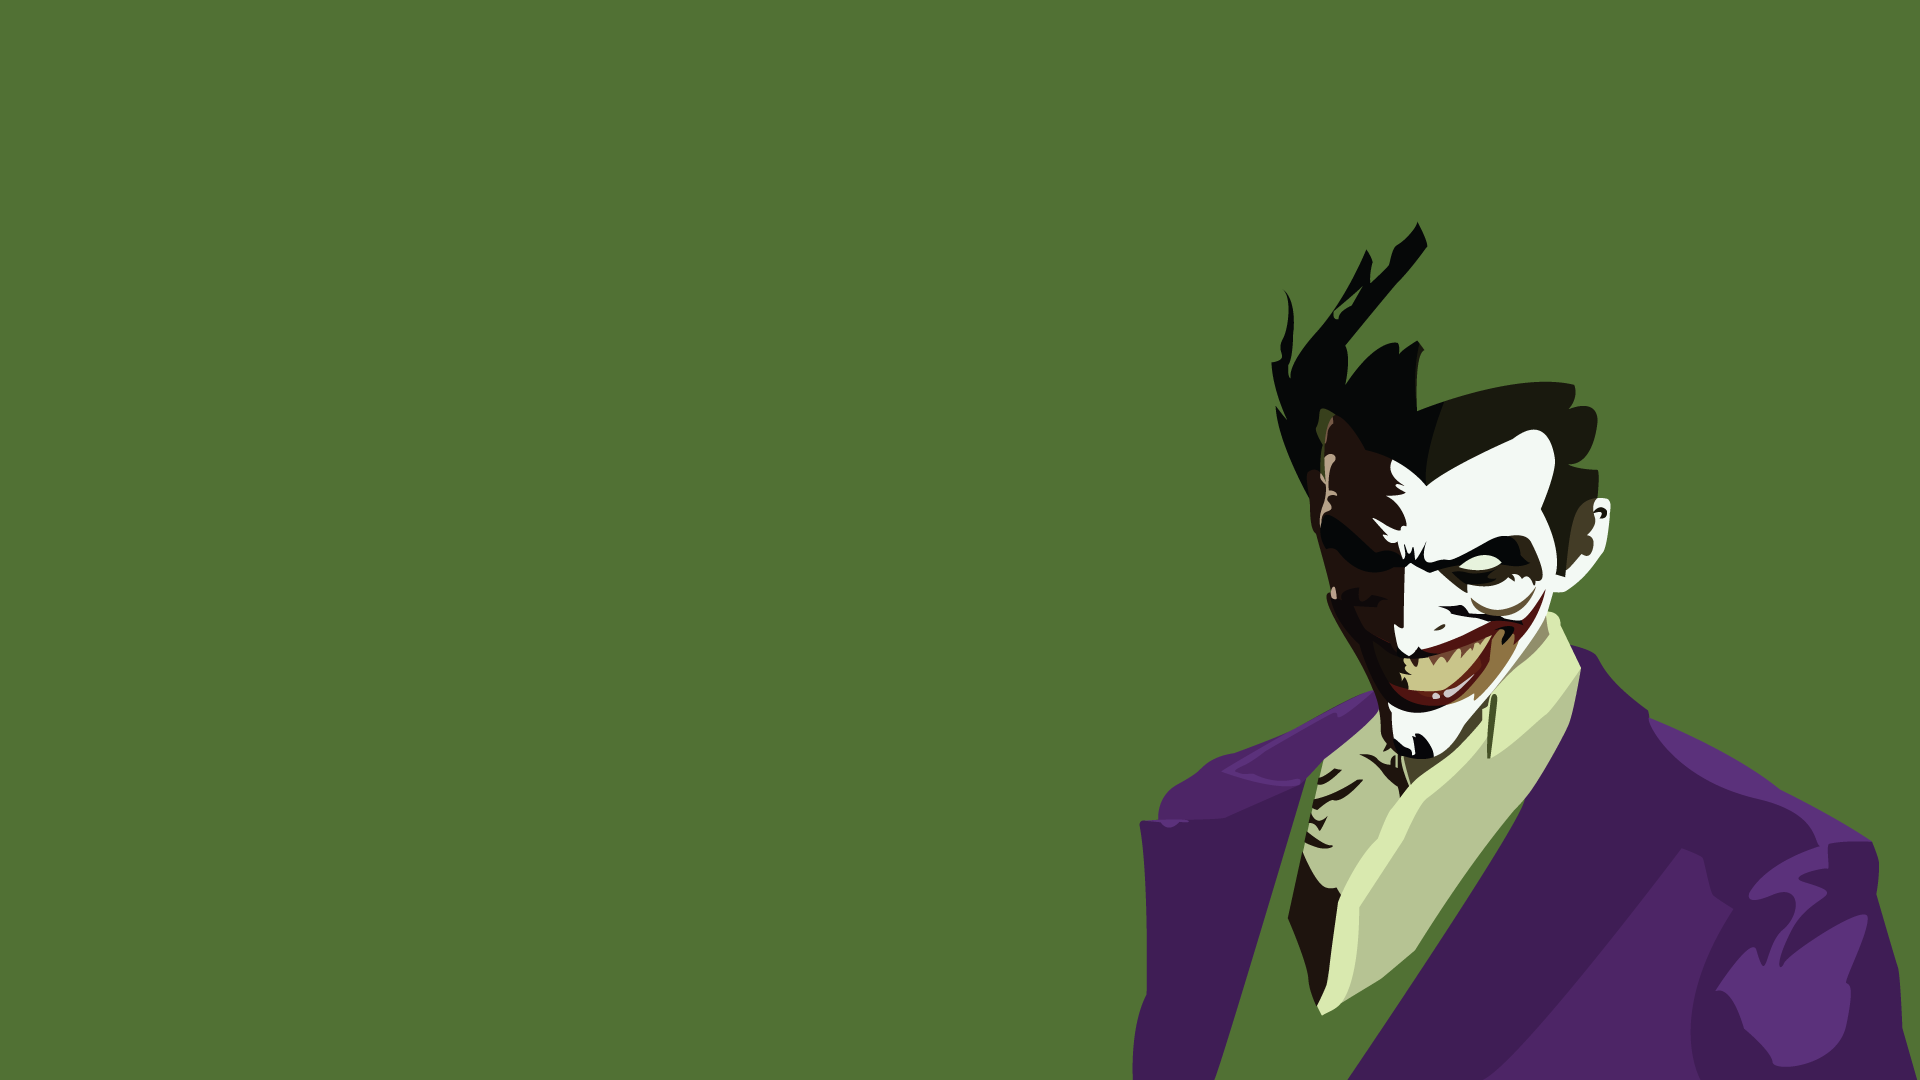 joker hd wallpaper background image 1920x1080 id